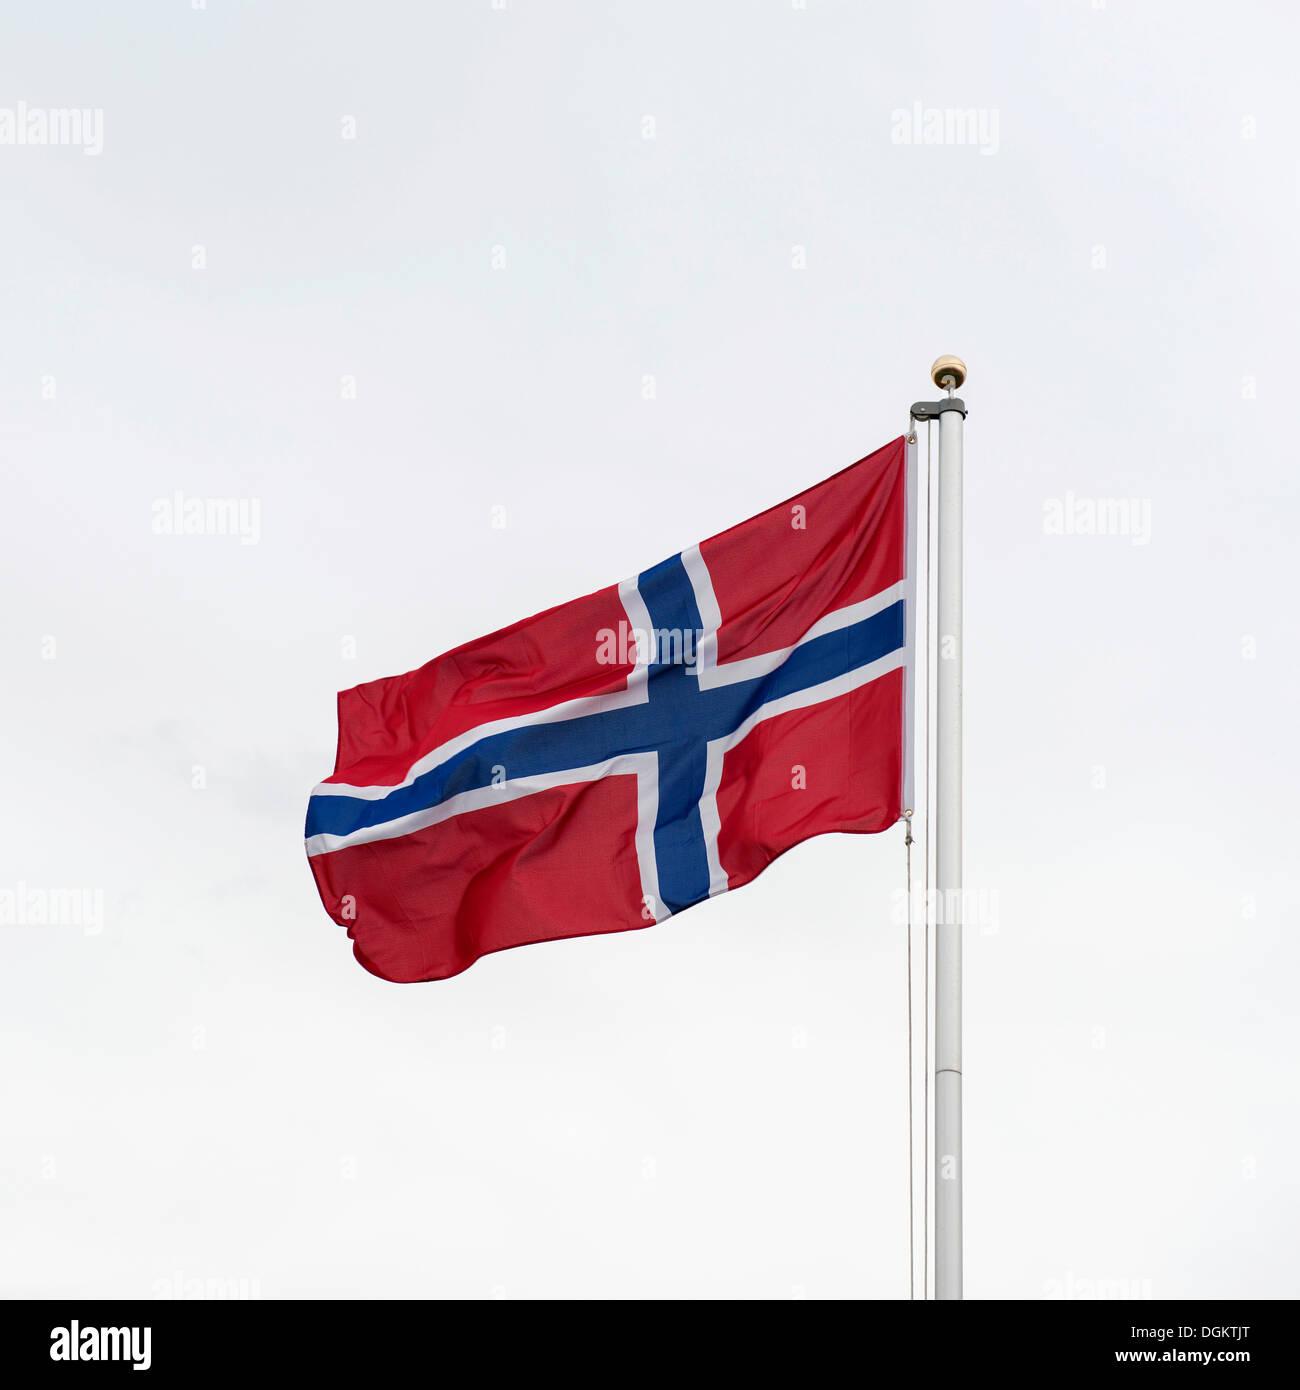 Brandissant un drapeau de la Norvège Photo Stock